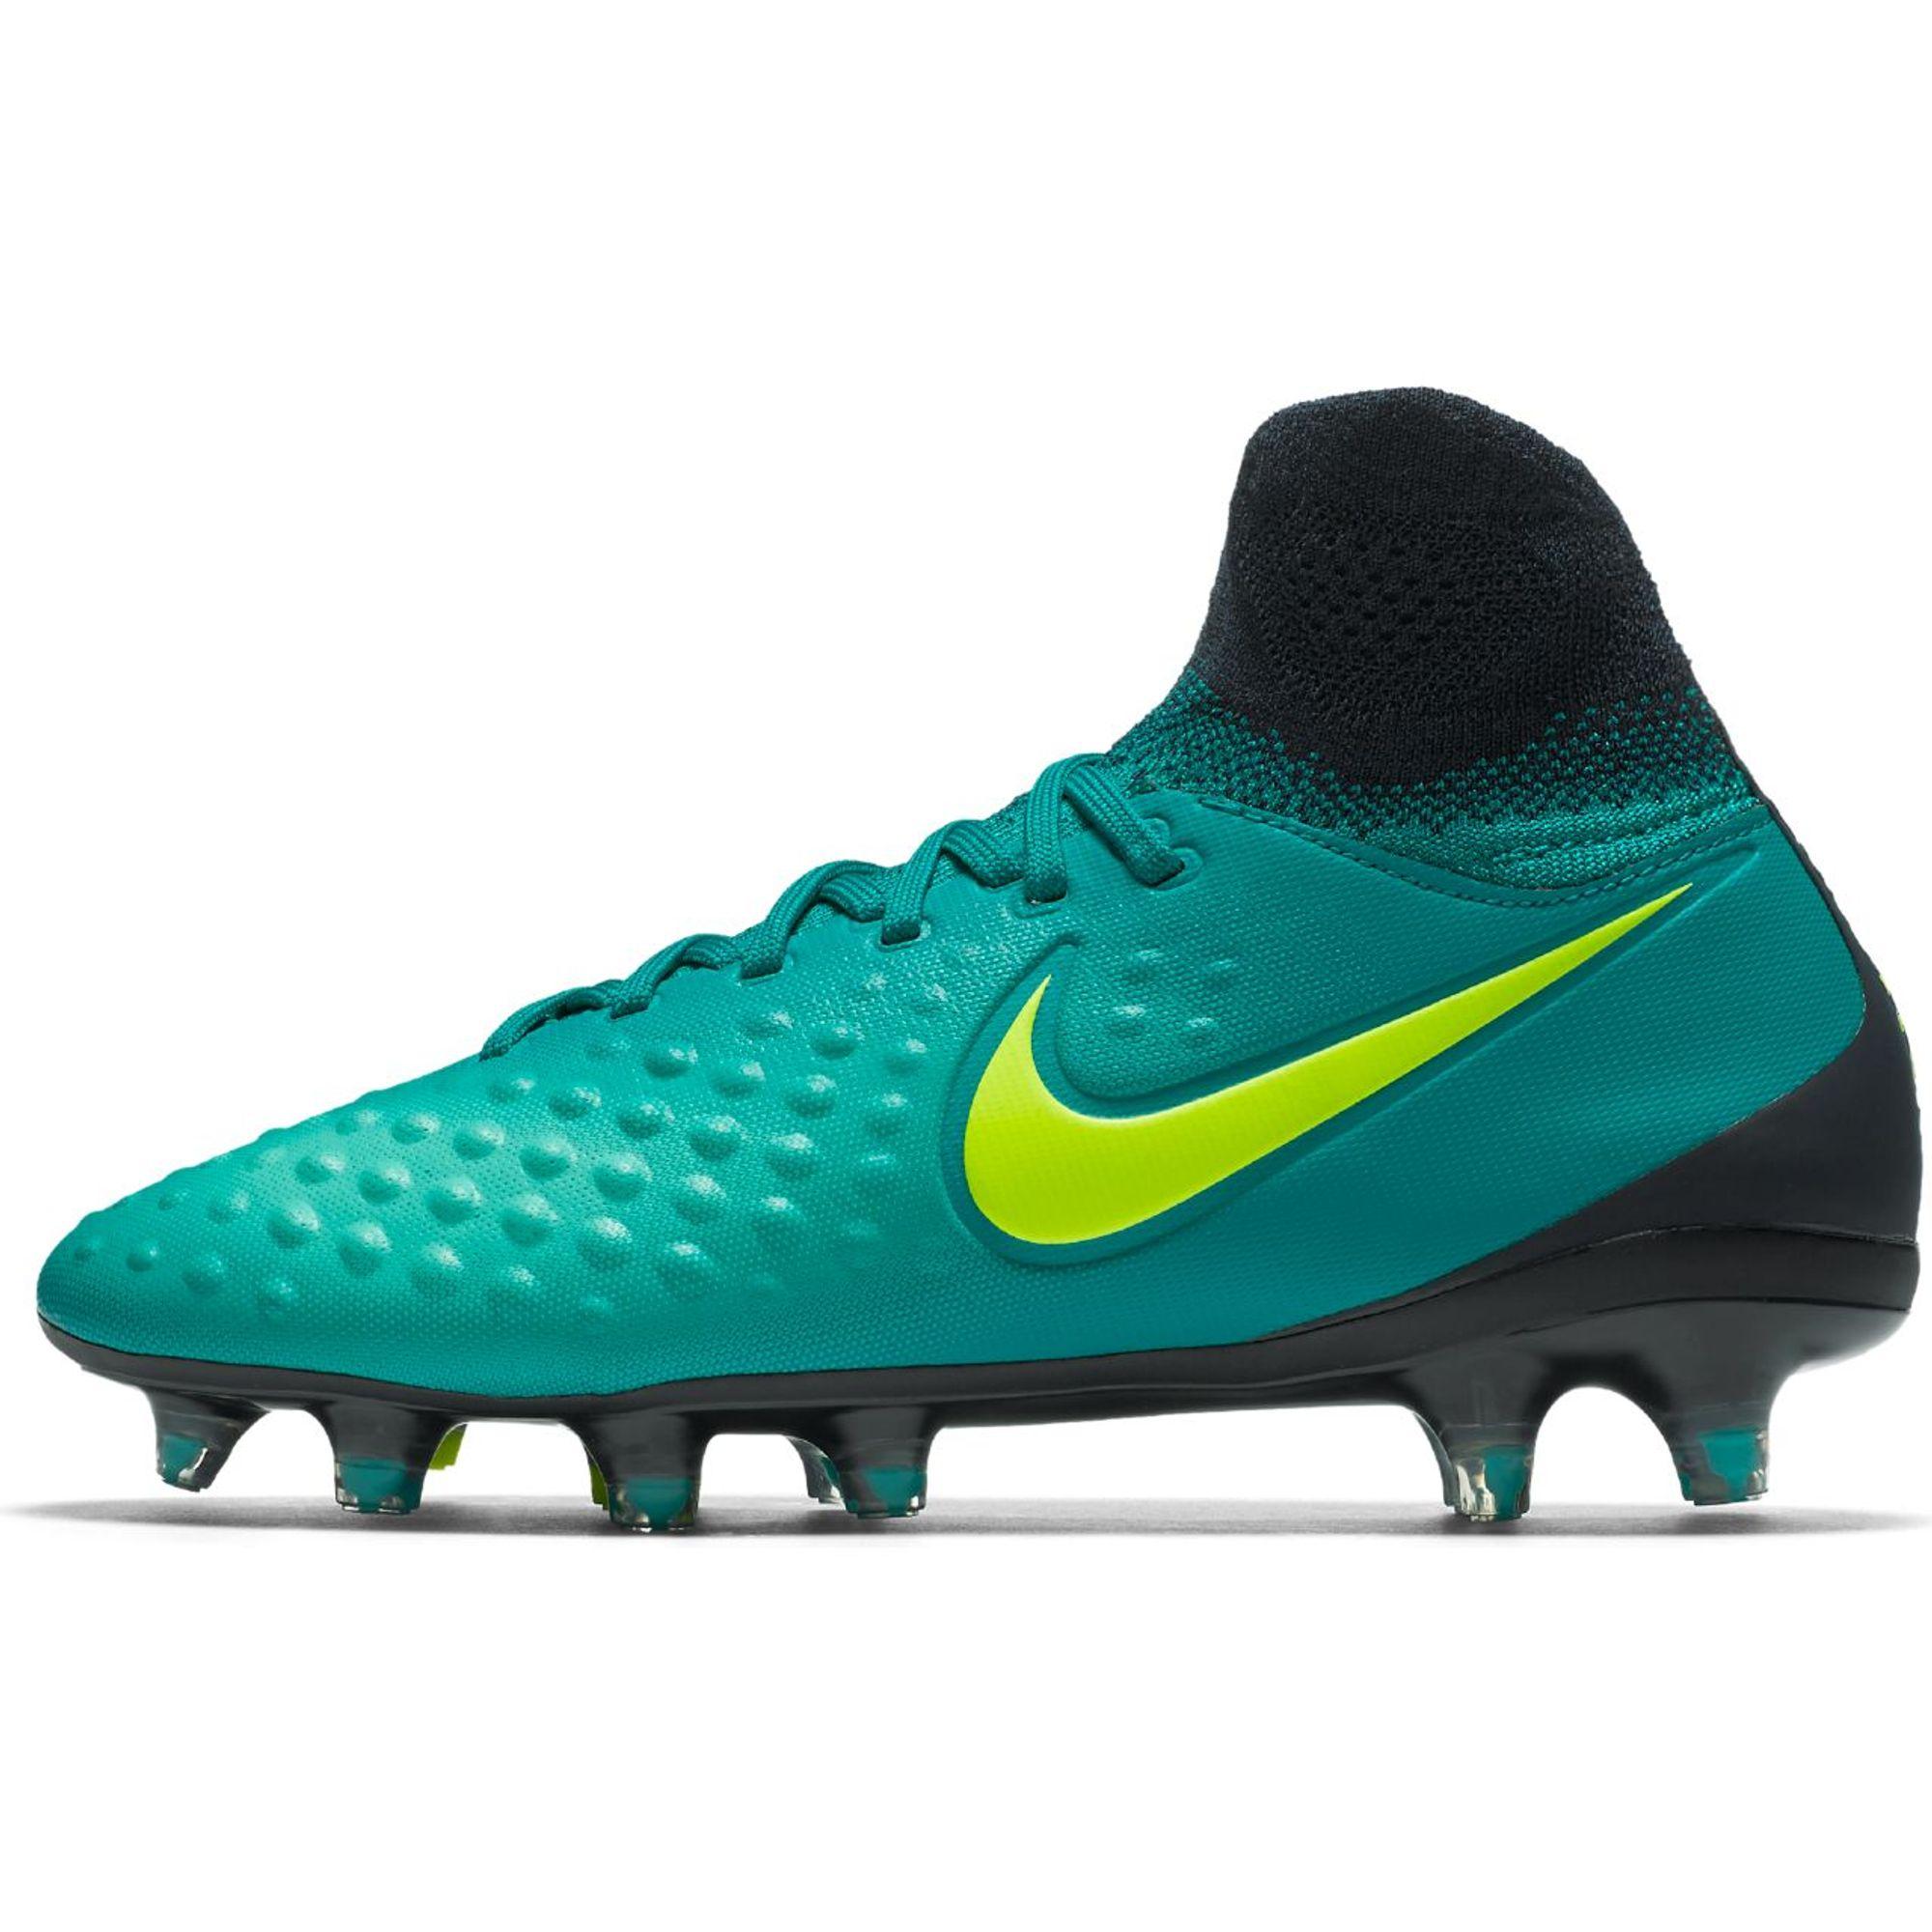 Nike Jr Magista Obra Ii Fg - rio teal/volt-obsidian-clr jd